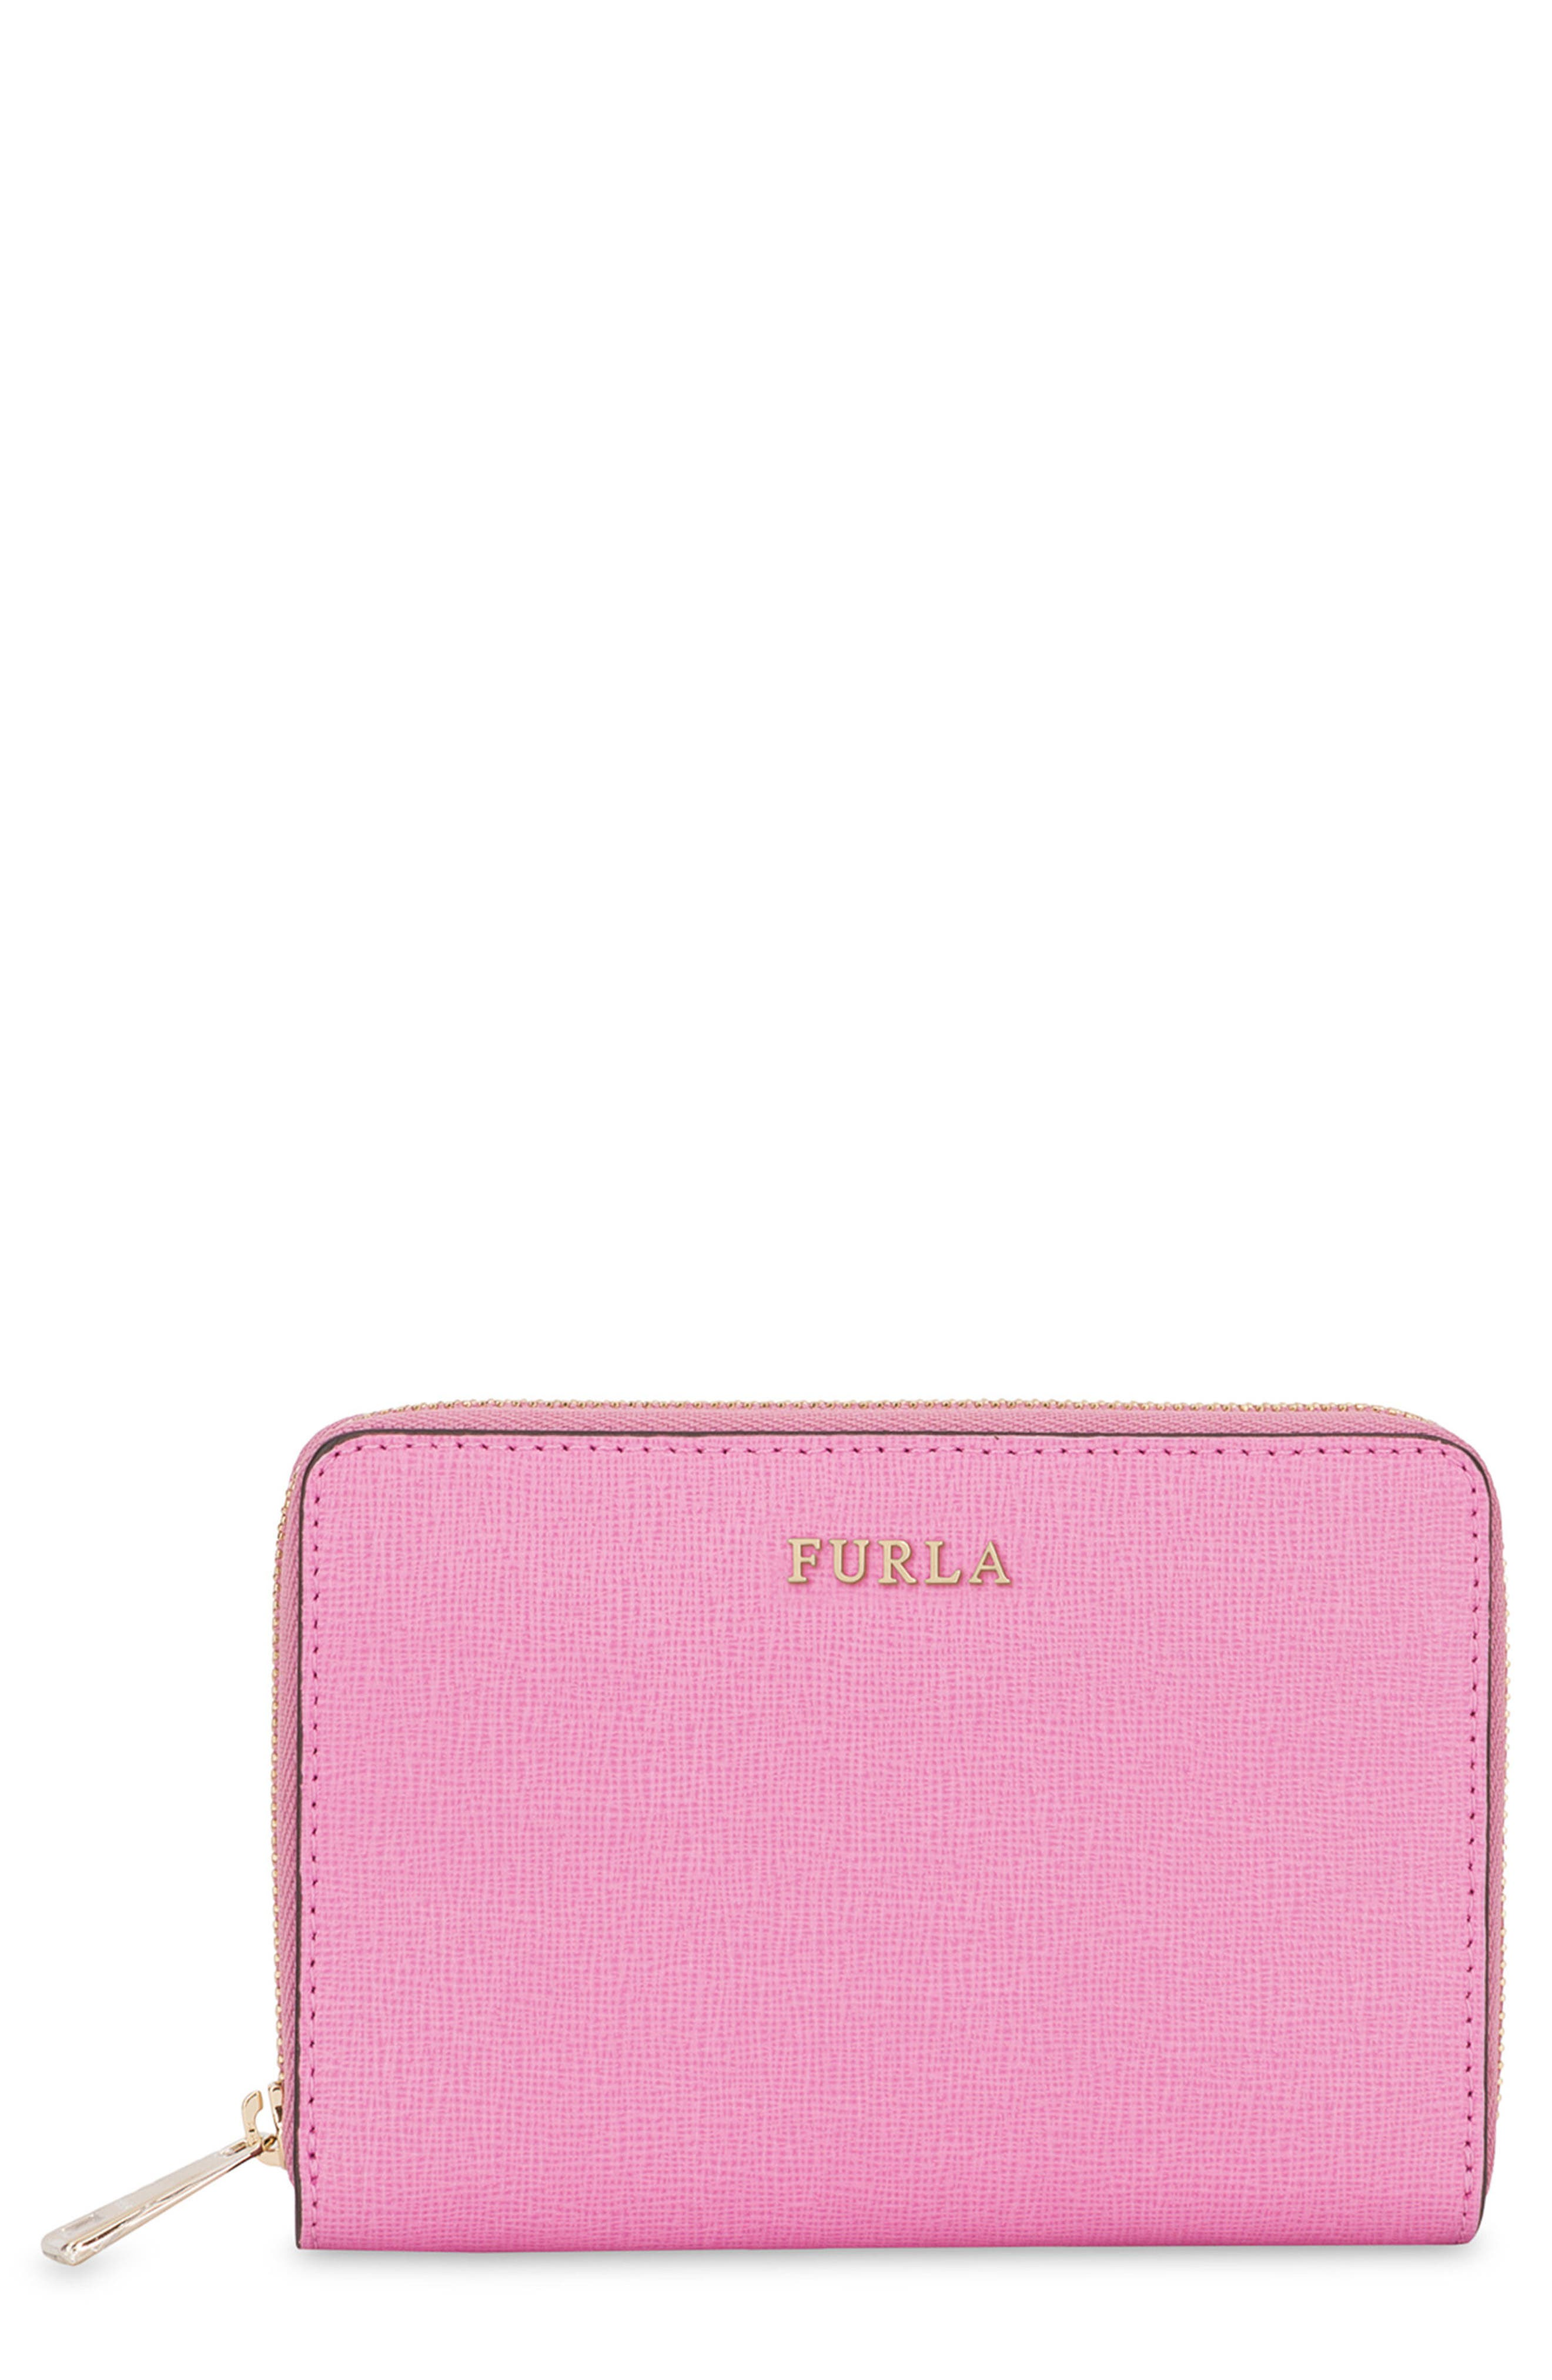 Medium Babylon Saffiano Leather Zip Around Wallet,                             Main thumbnail 2, color,